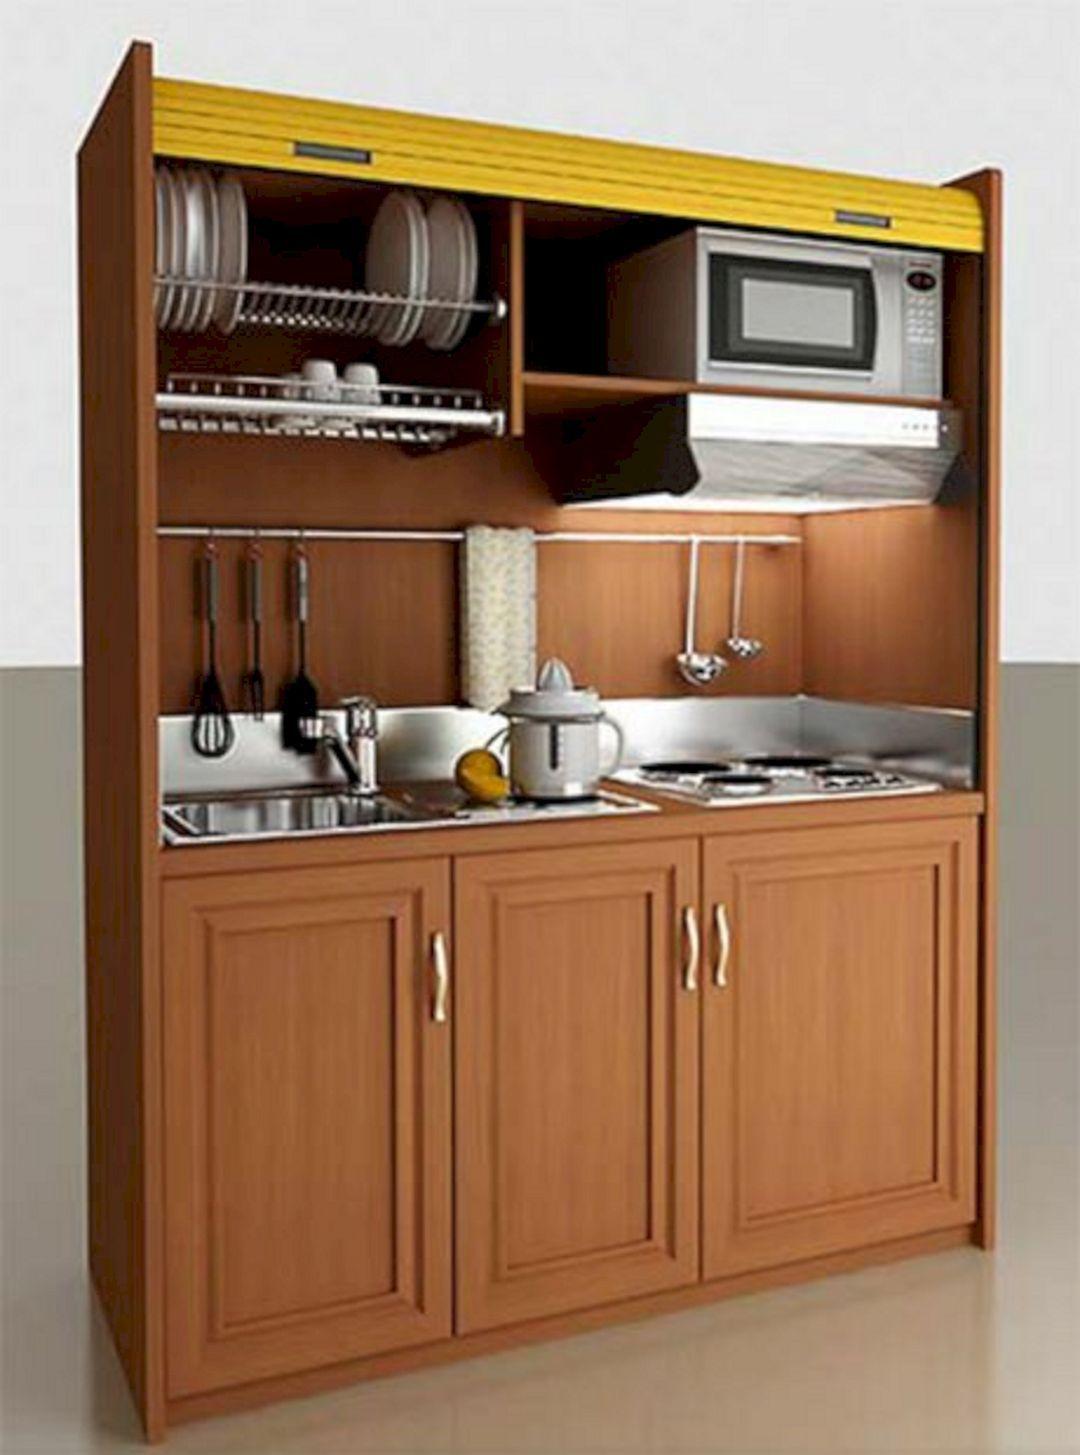 Epic 45 Best Charming Mini Kitchen Design Ideas For Inspiration Https Usdecorating Com 2245 45 B Kitchen Cupboard Designs Tiny Kitchen Kitchen Cabinet Design